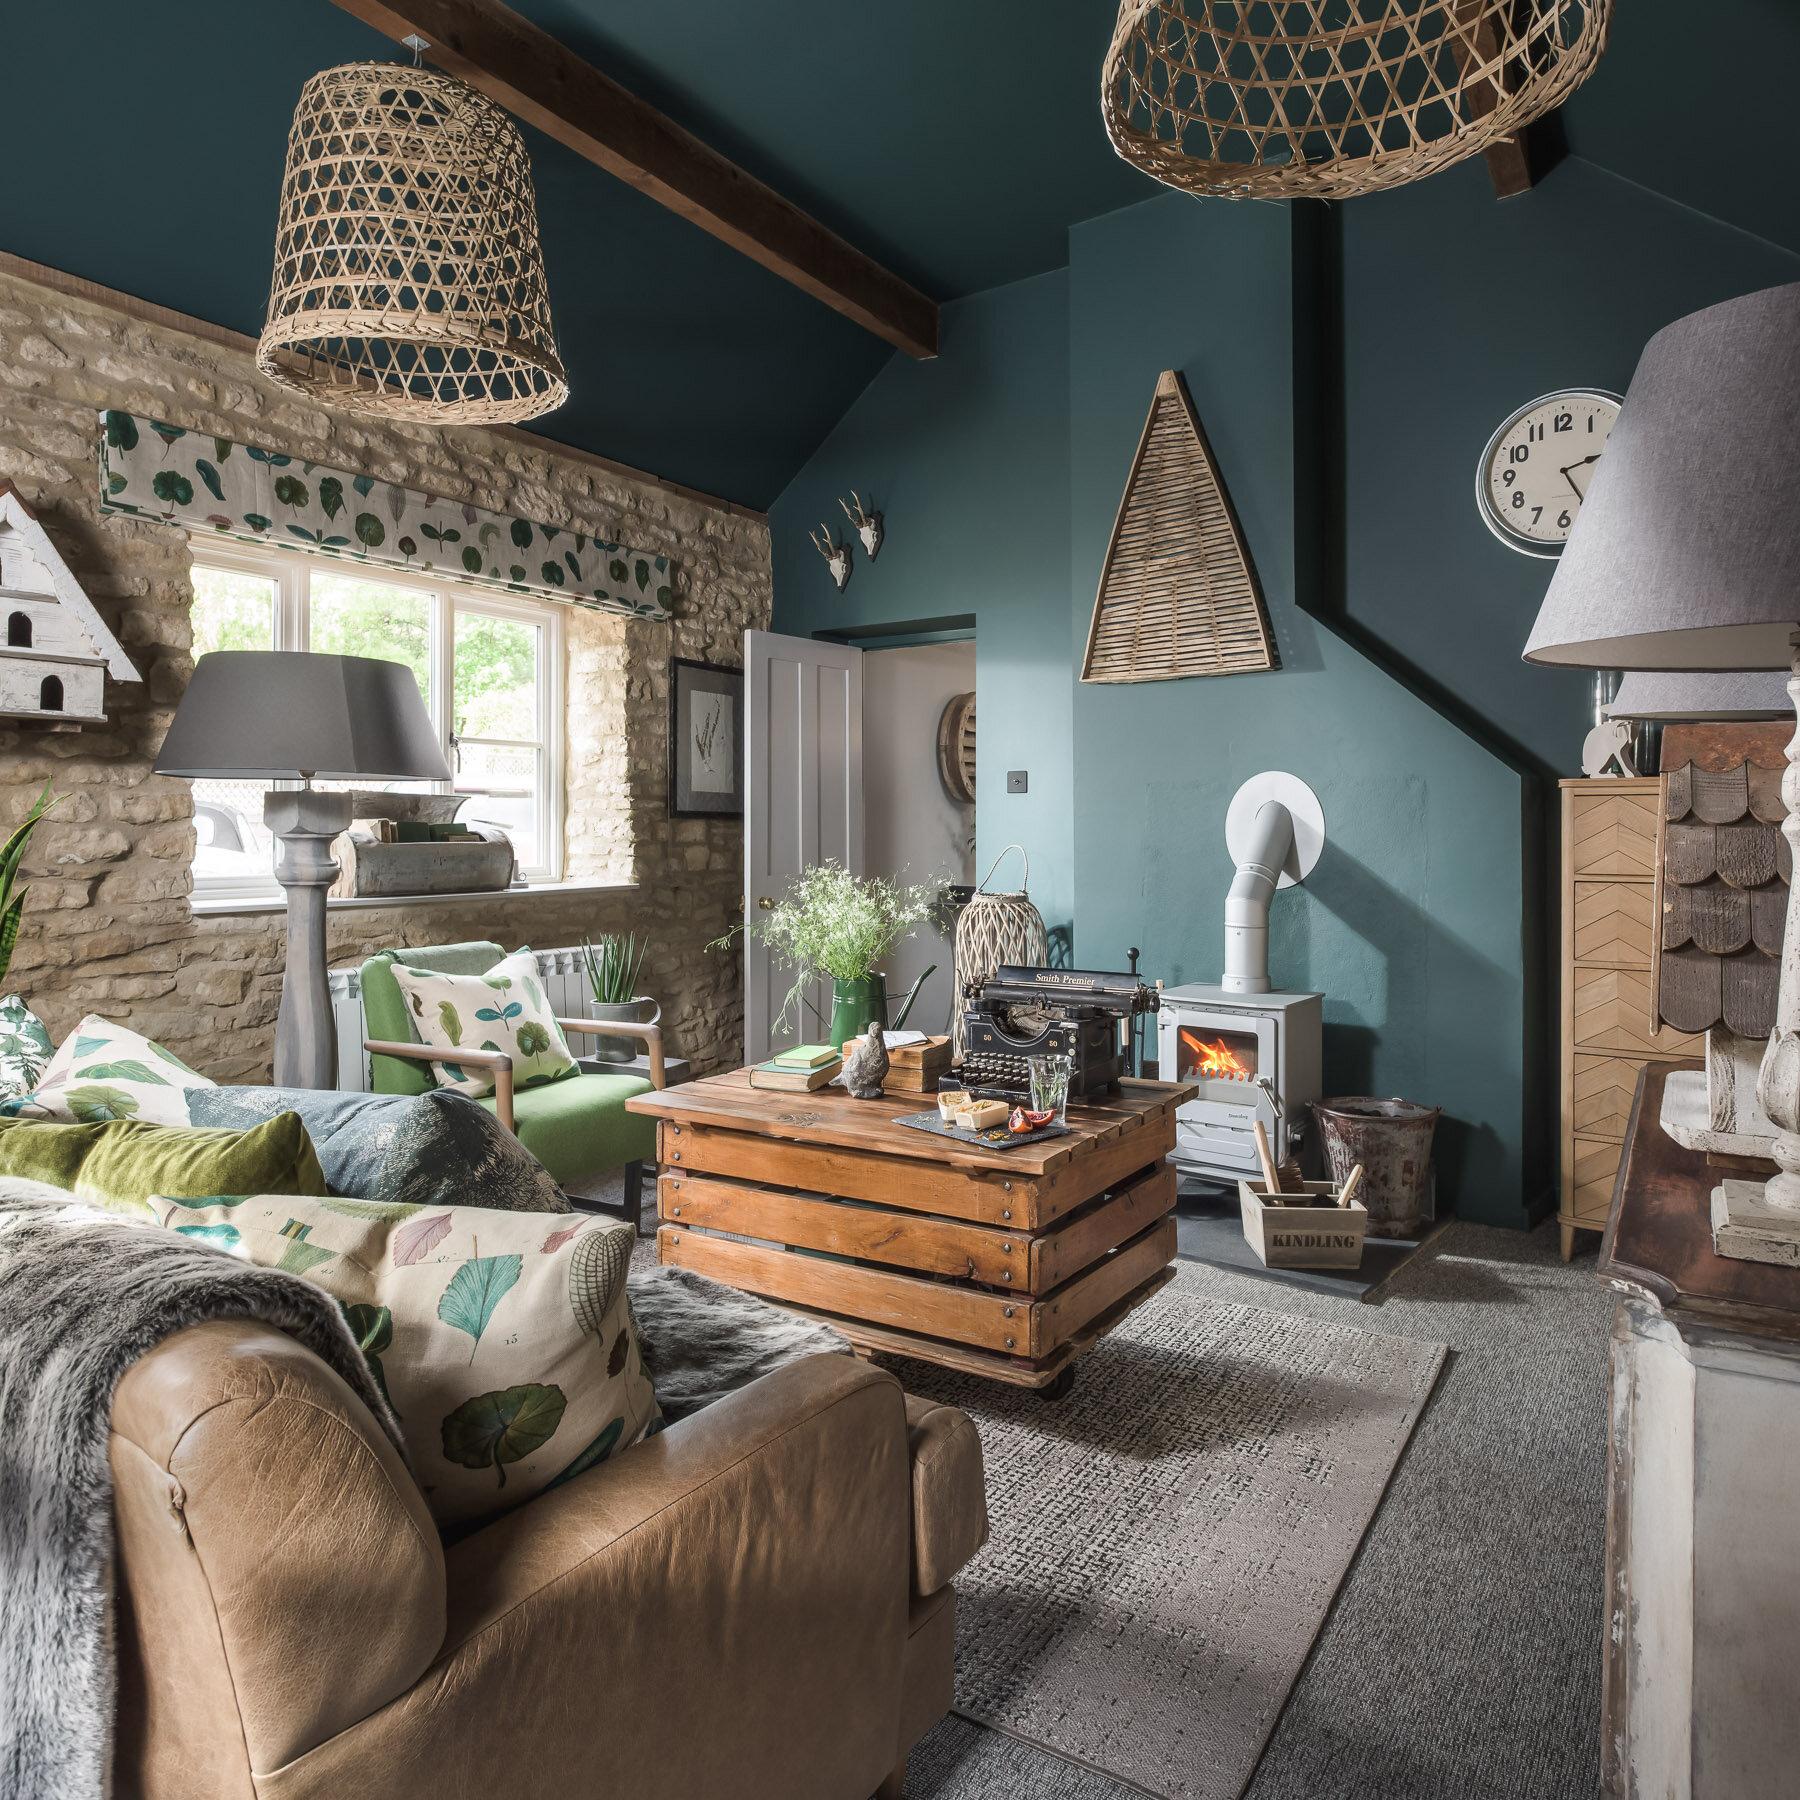 INTERIOR DESIGN & DECORATION   We design thoughtful, livable spaces